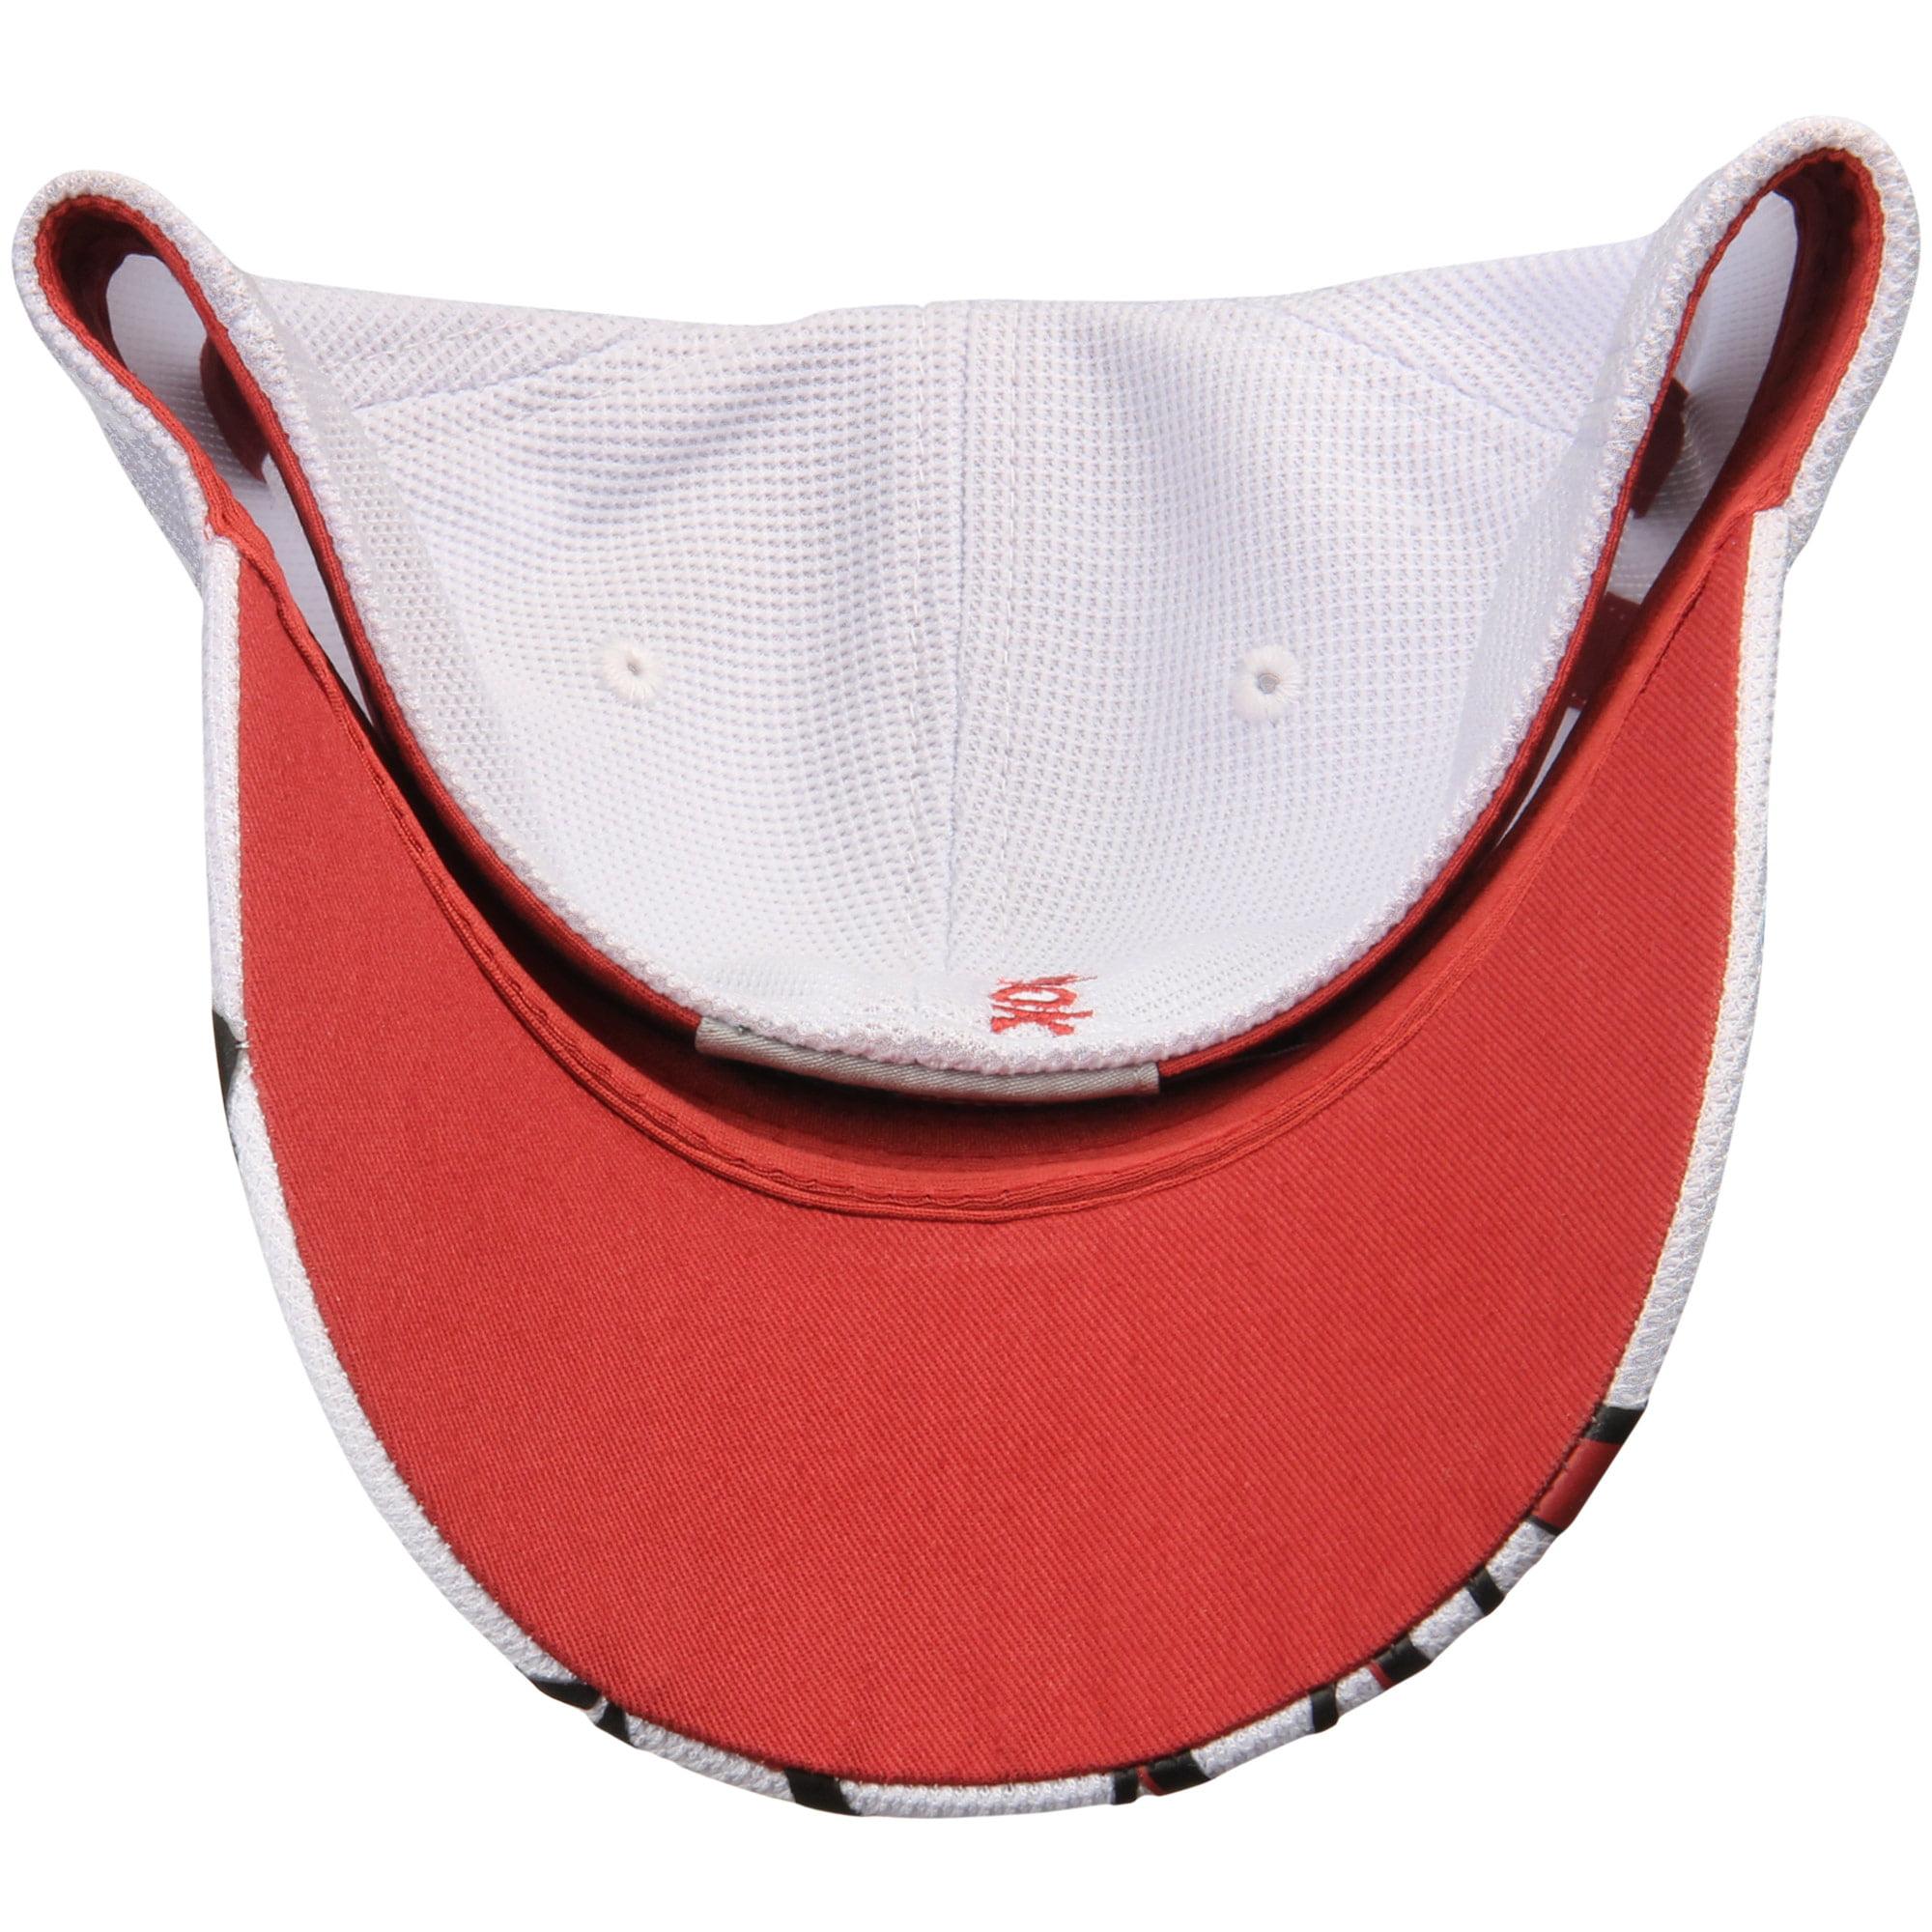 new product b8dde bebe1 Arizona Coyotes Reebok Face Off Draft Flex Hat - White - Walmart.com